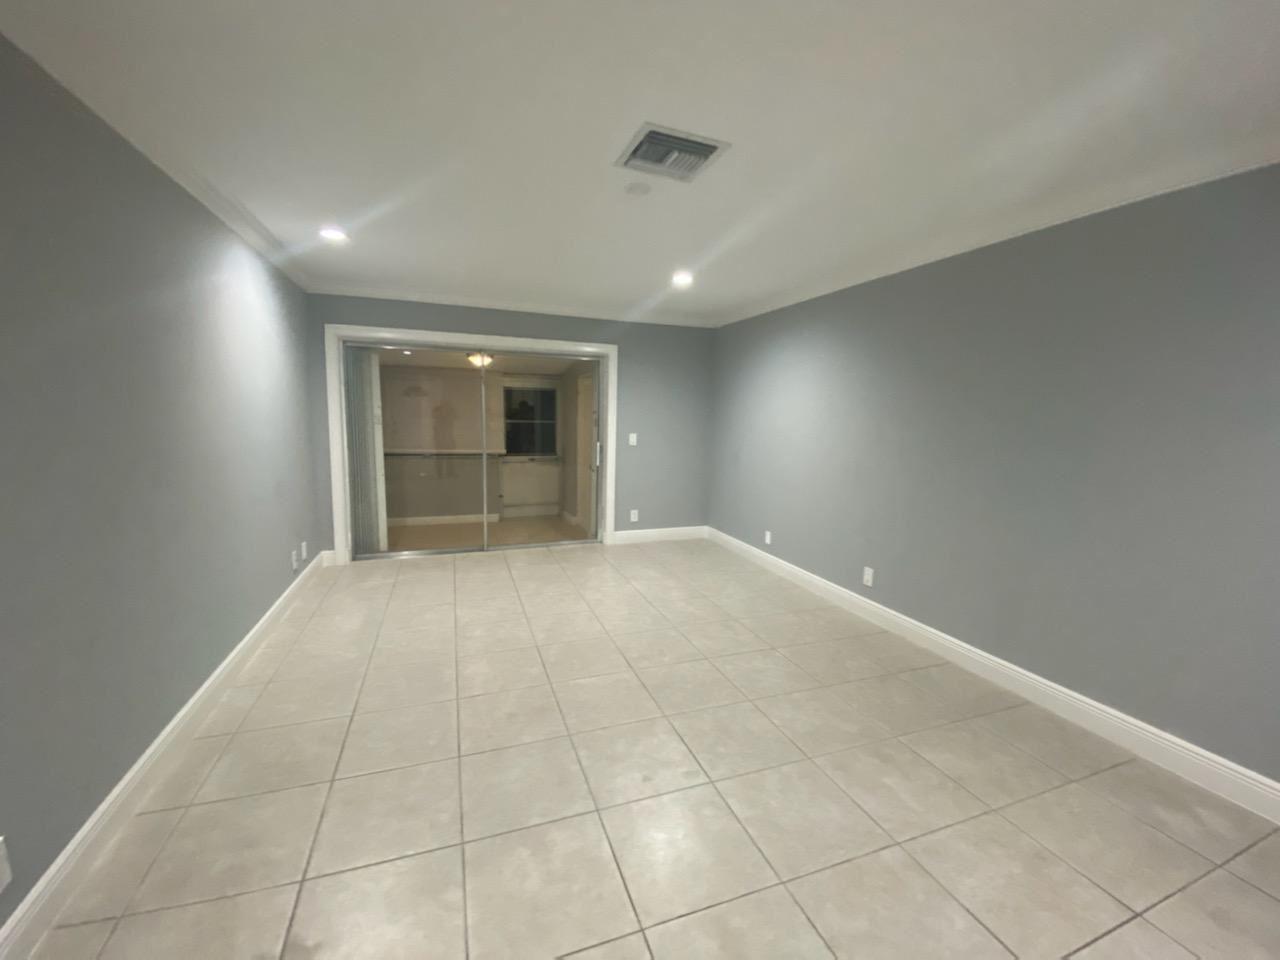 2940 Crosley Drive E #H, West Palm Beach, FL 33415 - #: RX-10687920